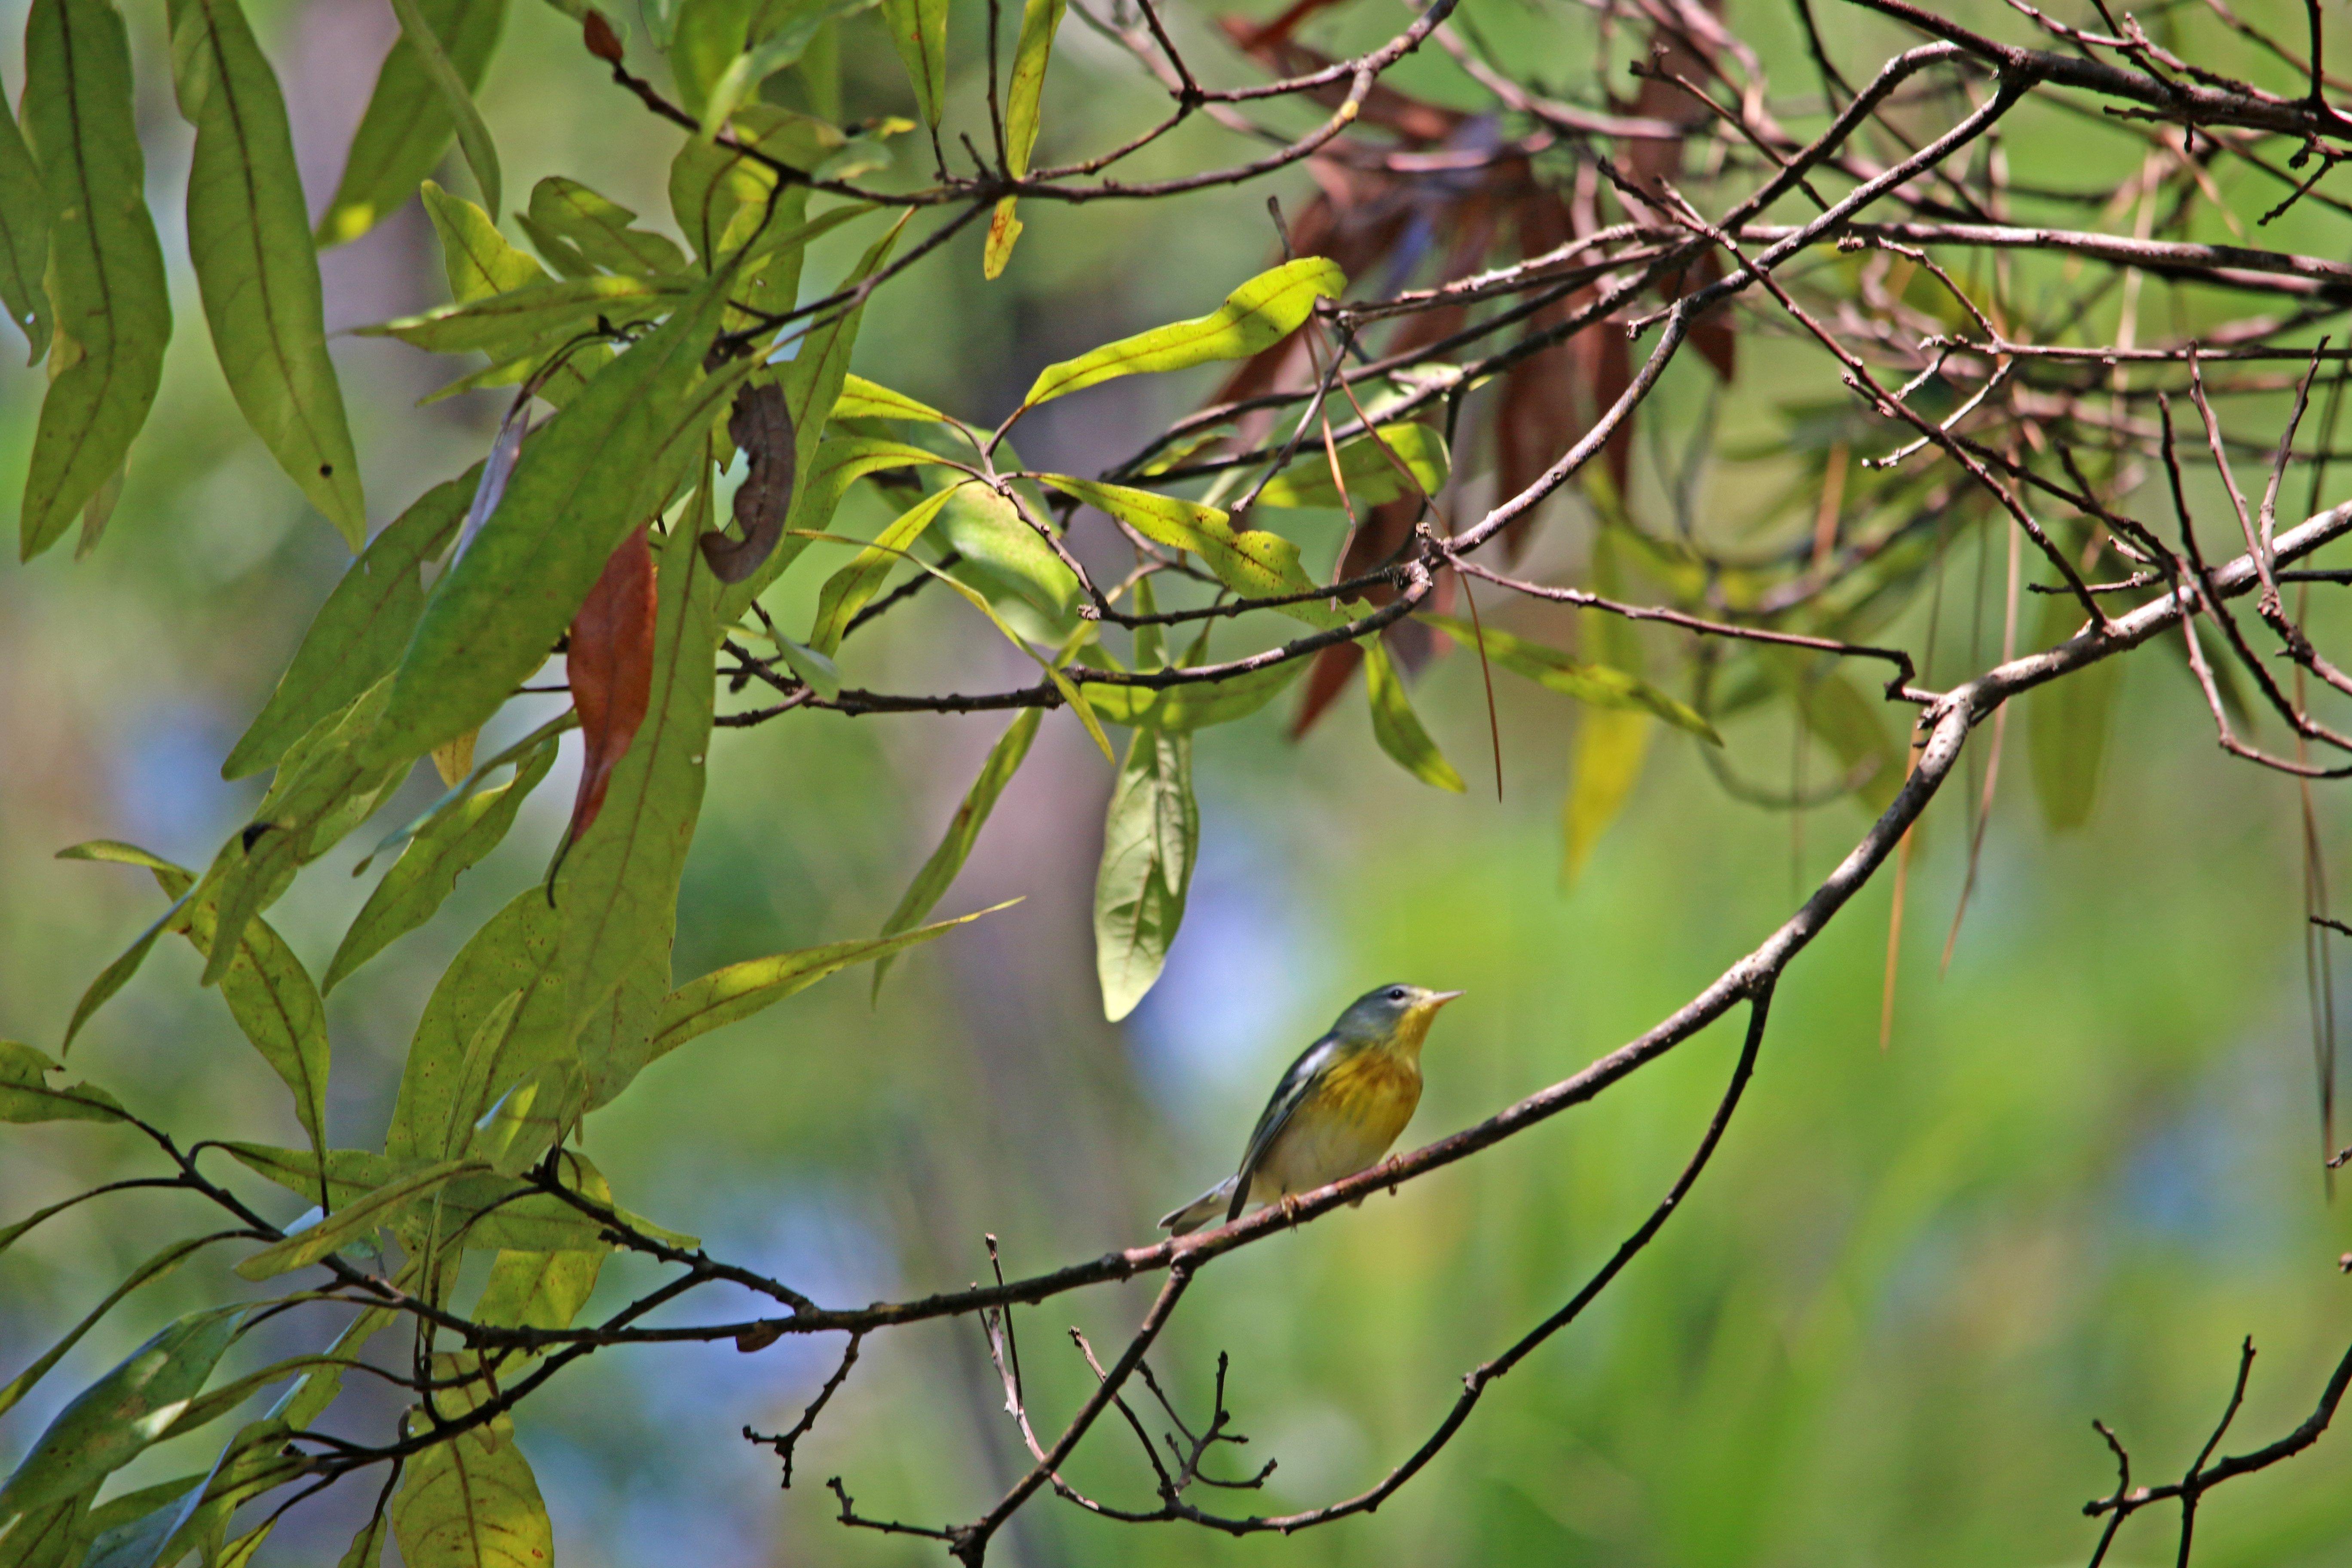 florida, state park, nature, birding